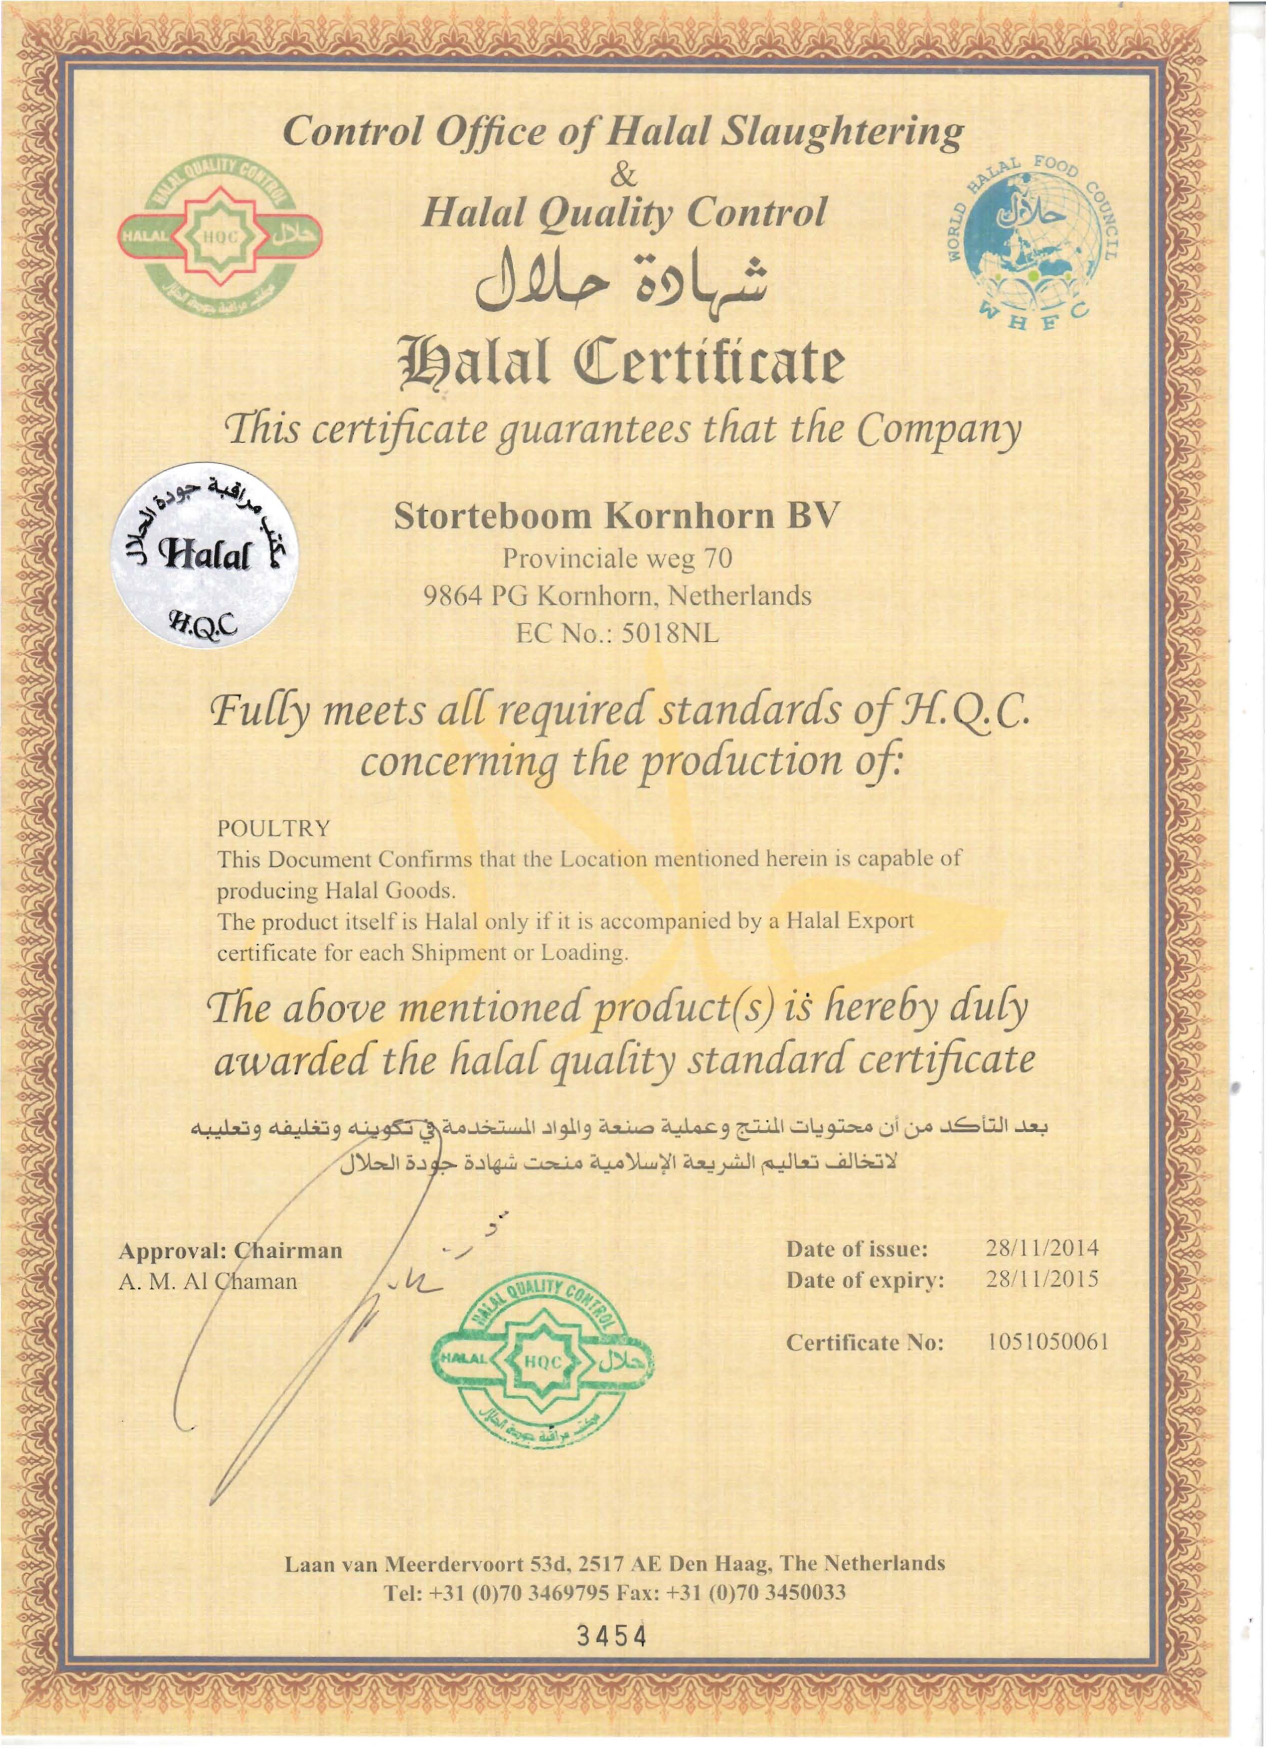 Halal certificate Storteboom Kornhorn B.V.